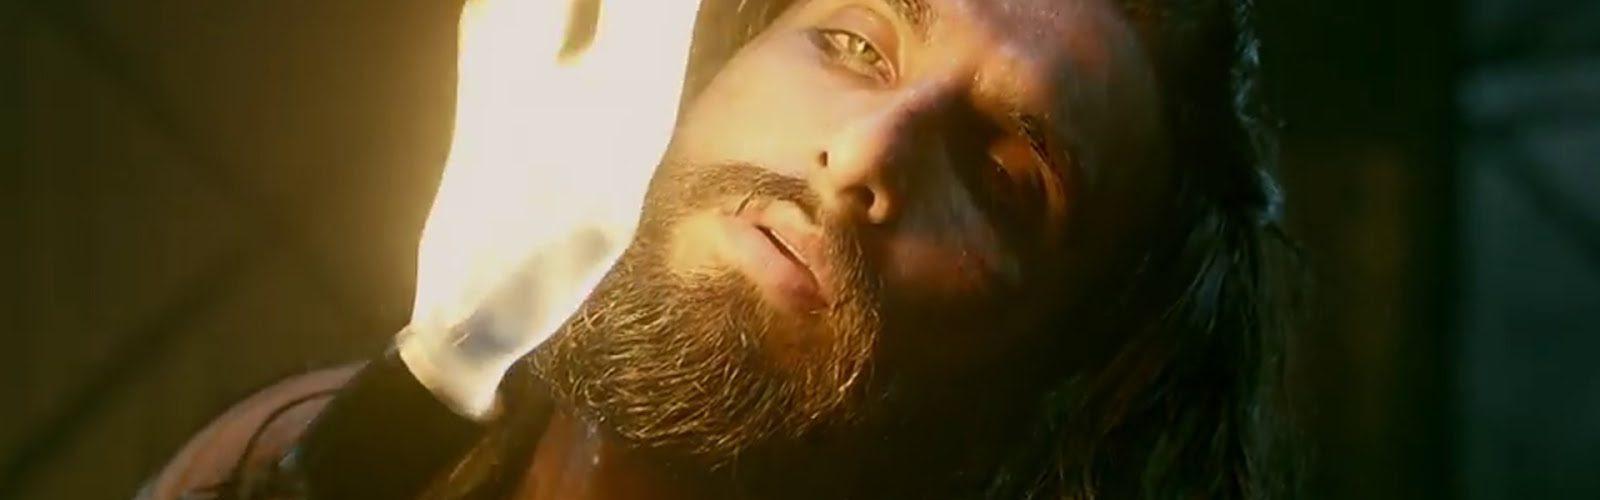 Ranveer Singh starrer 'Padmaavat' beats 'Sultan's record on box office